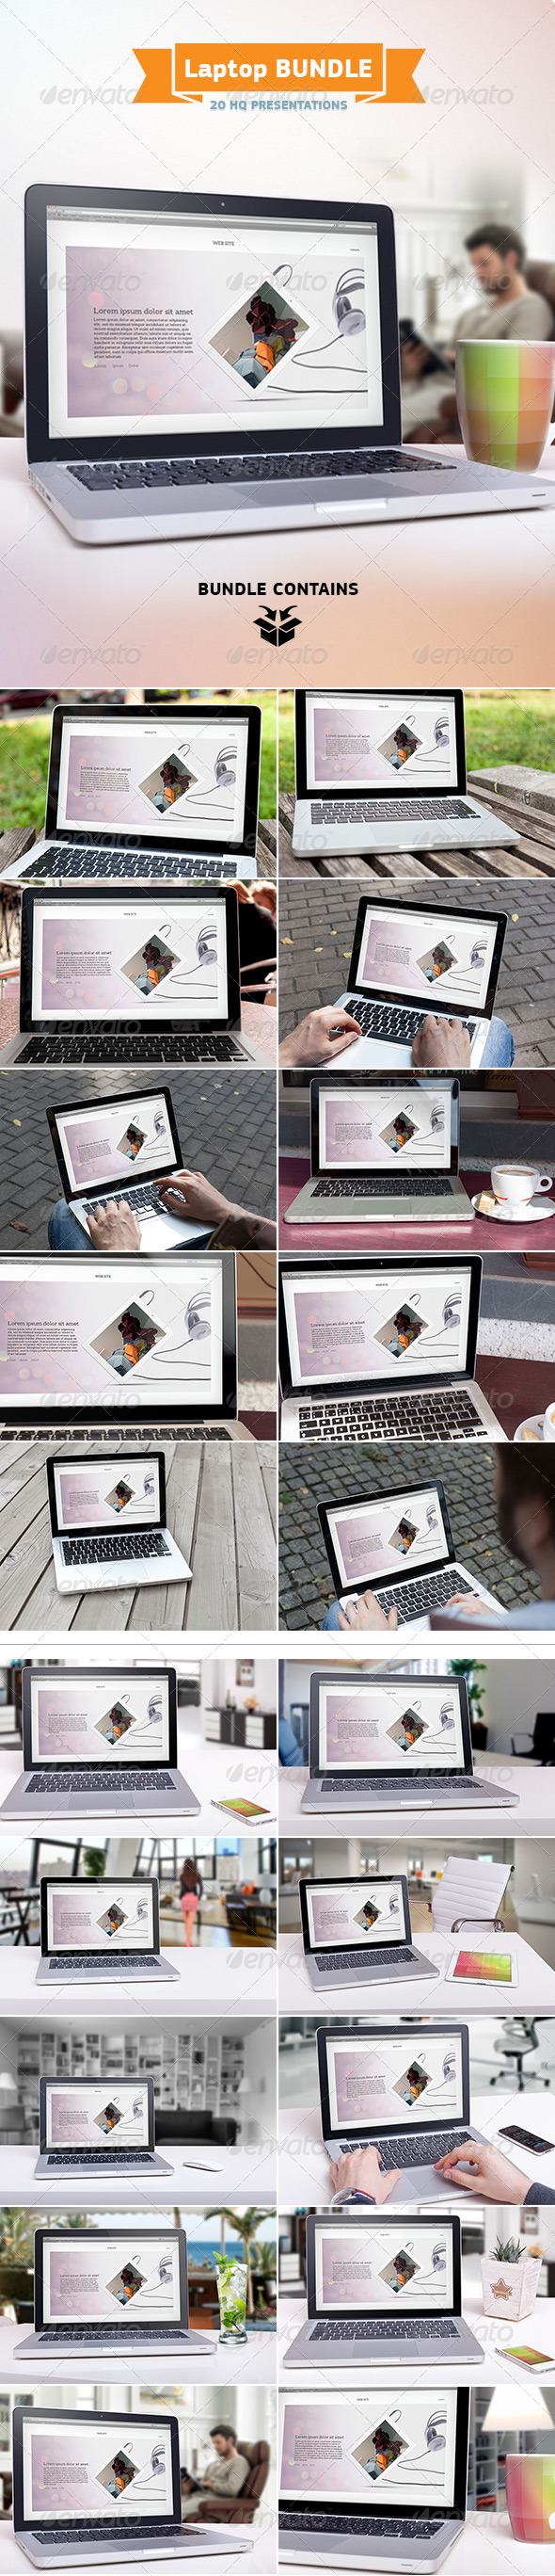 GraphicRiver Laptop Screen Mockup Bundle 7706859